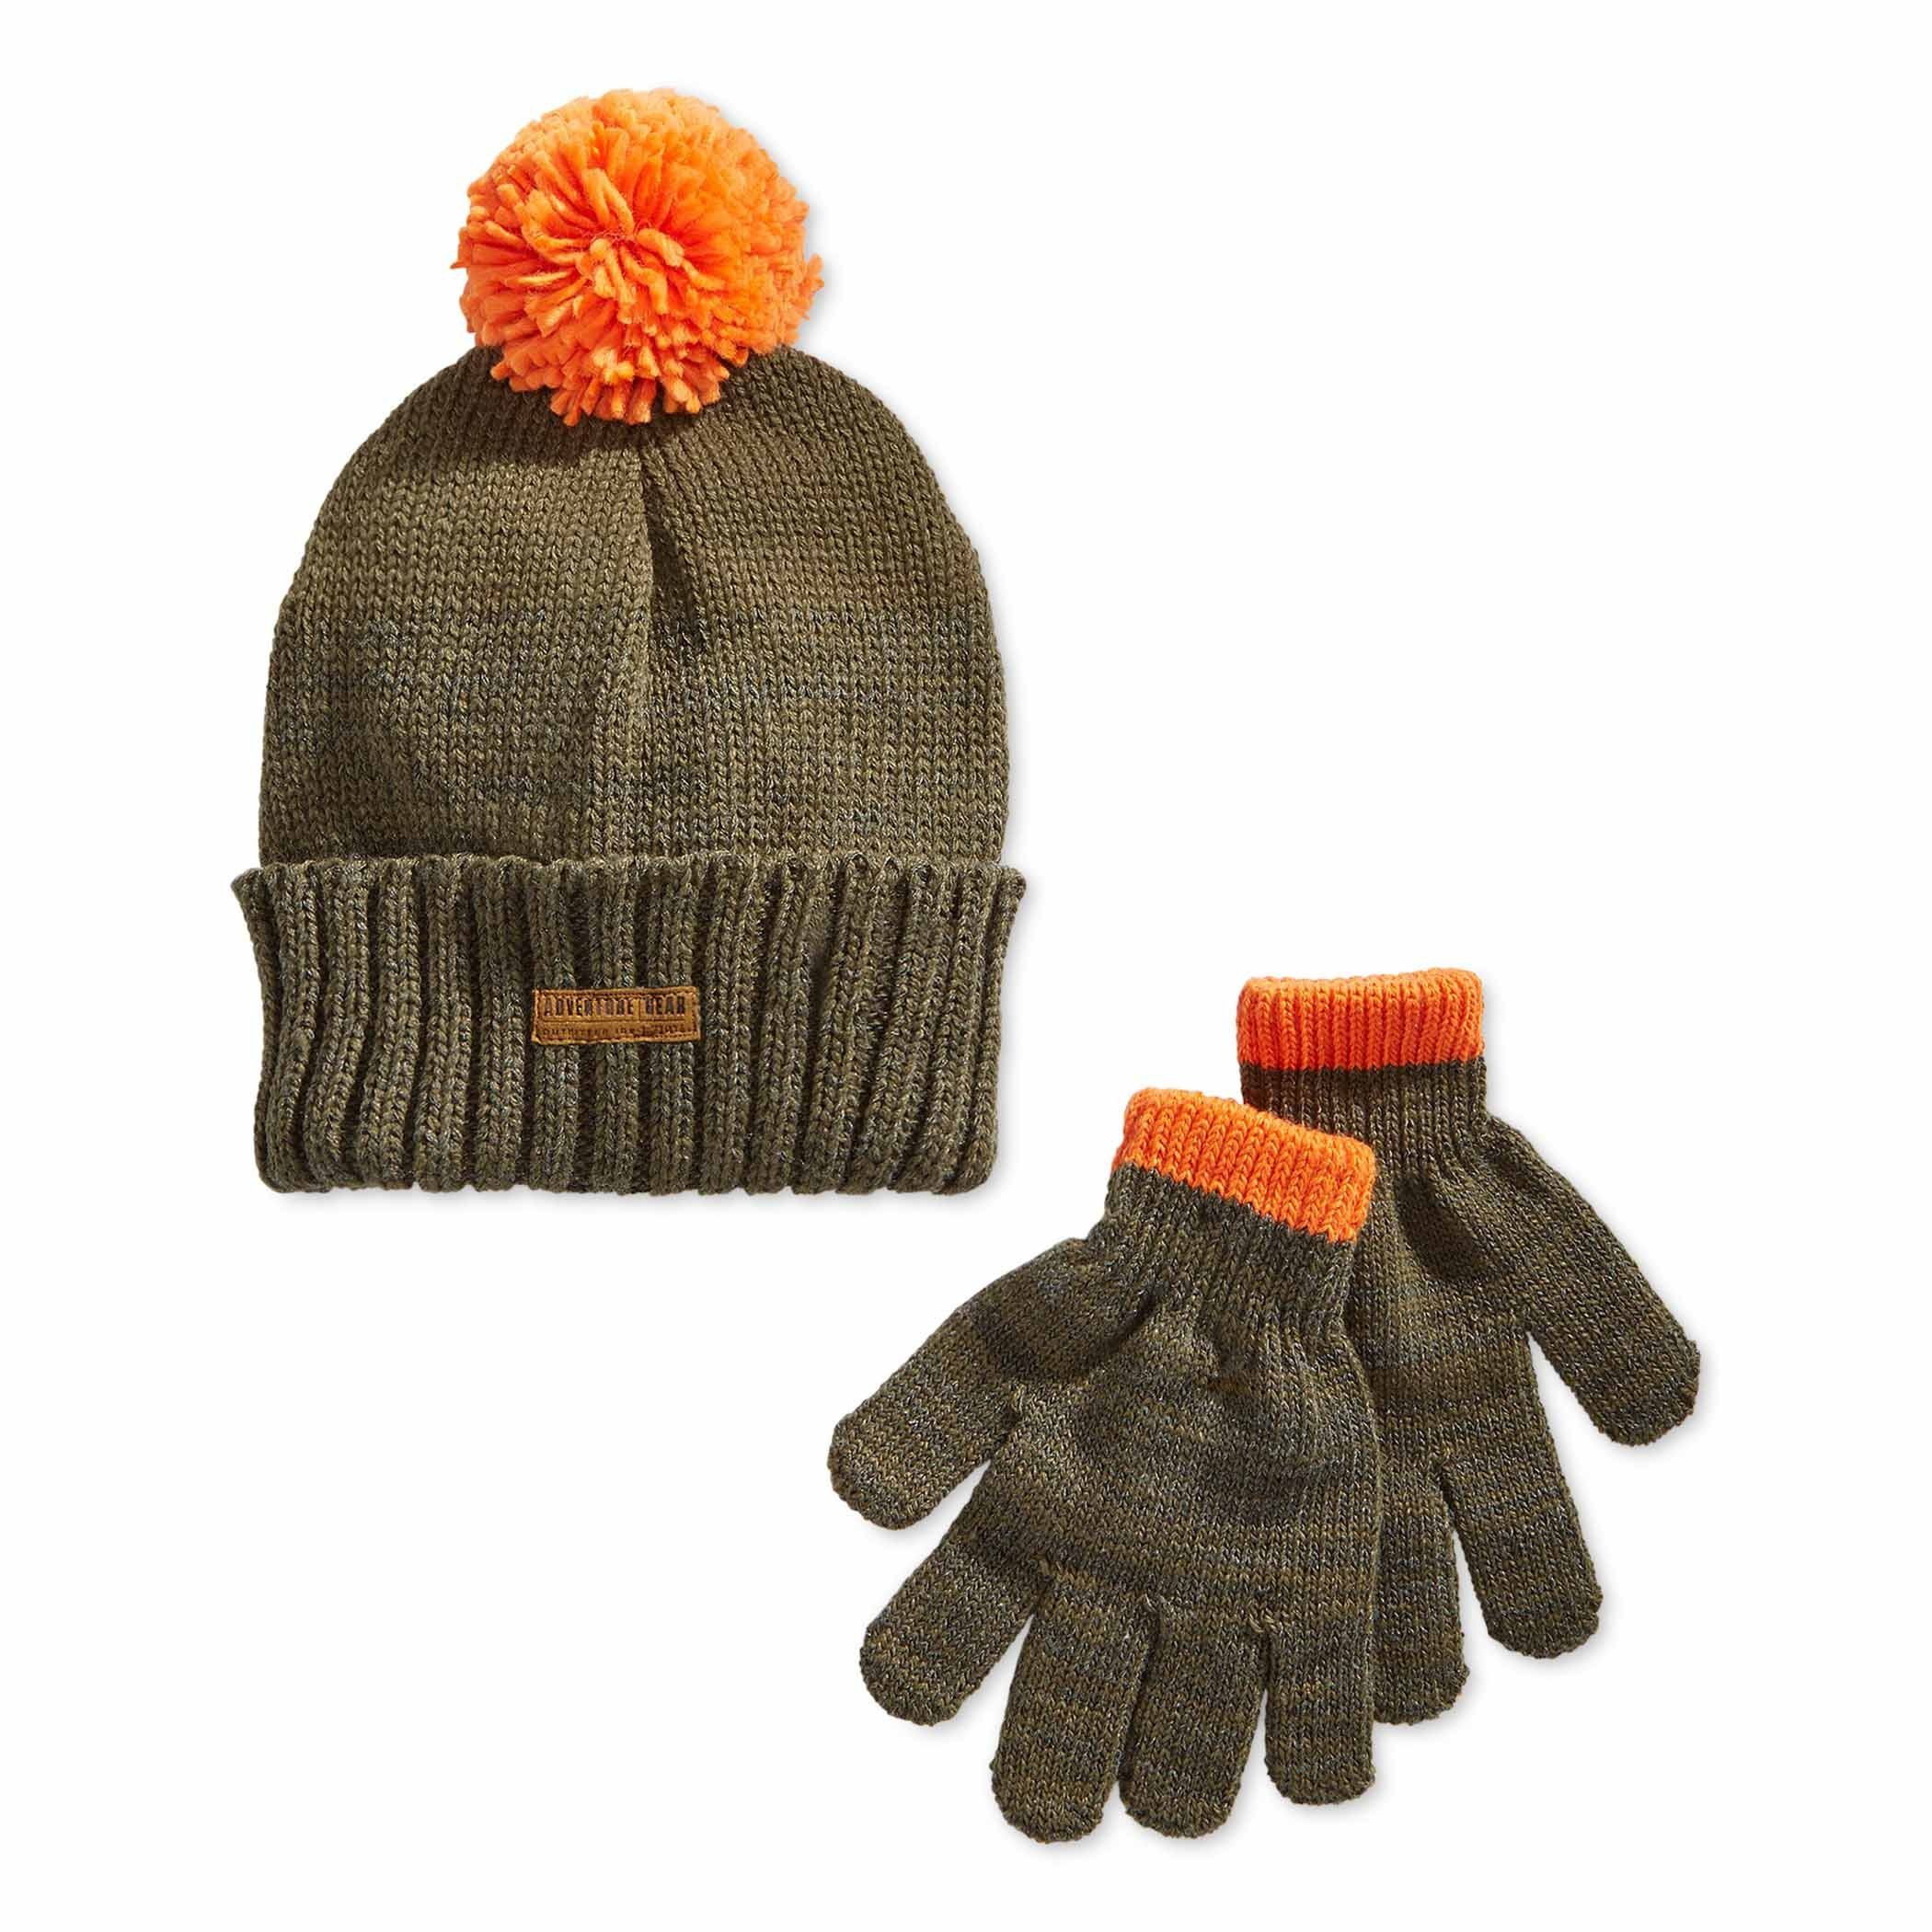 94e3475a Carter's Little Boys Olive Green / Orange Hat and Stretch Gloves Set - Size  4-